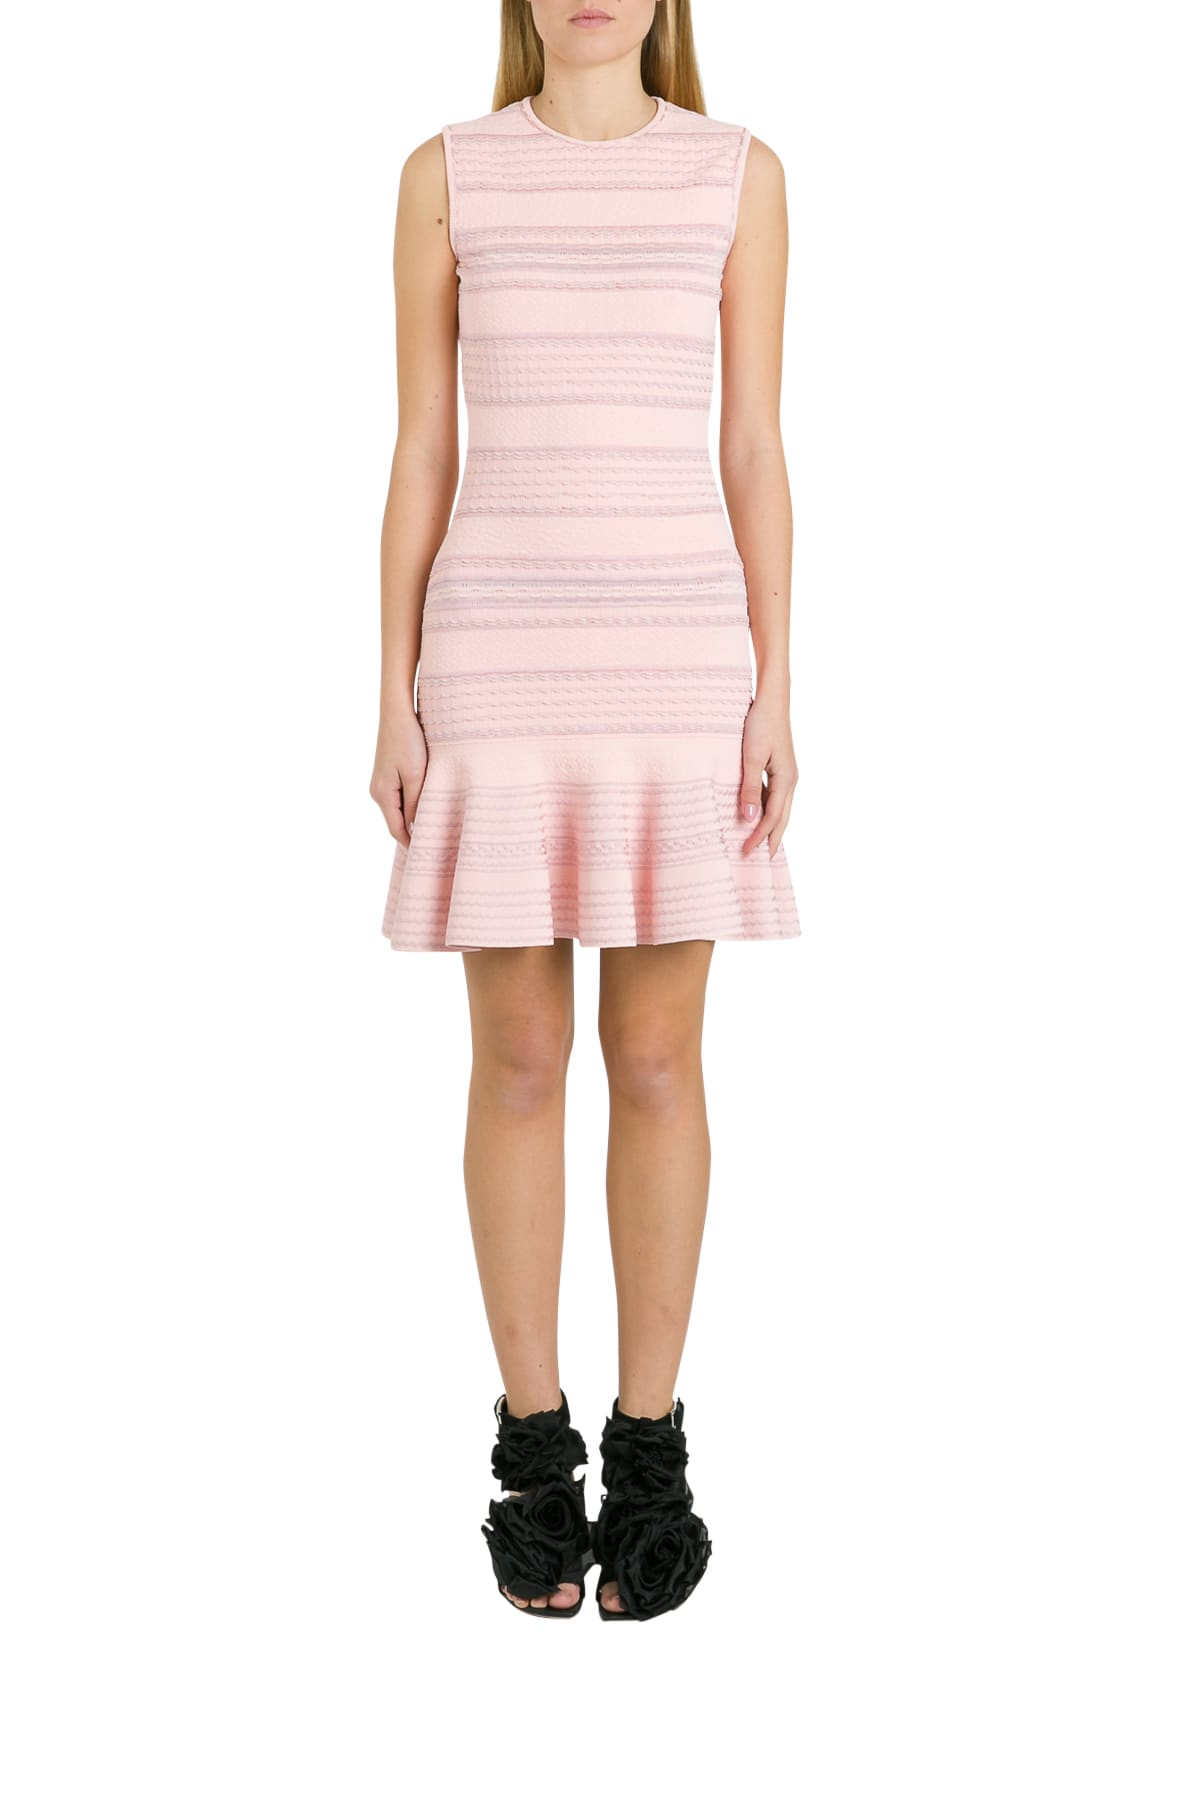 Alexander Mcqueen Dresses TEXTURED KNIT EMBOSSED DRESS